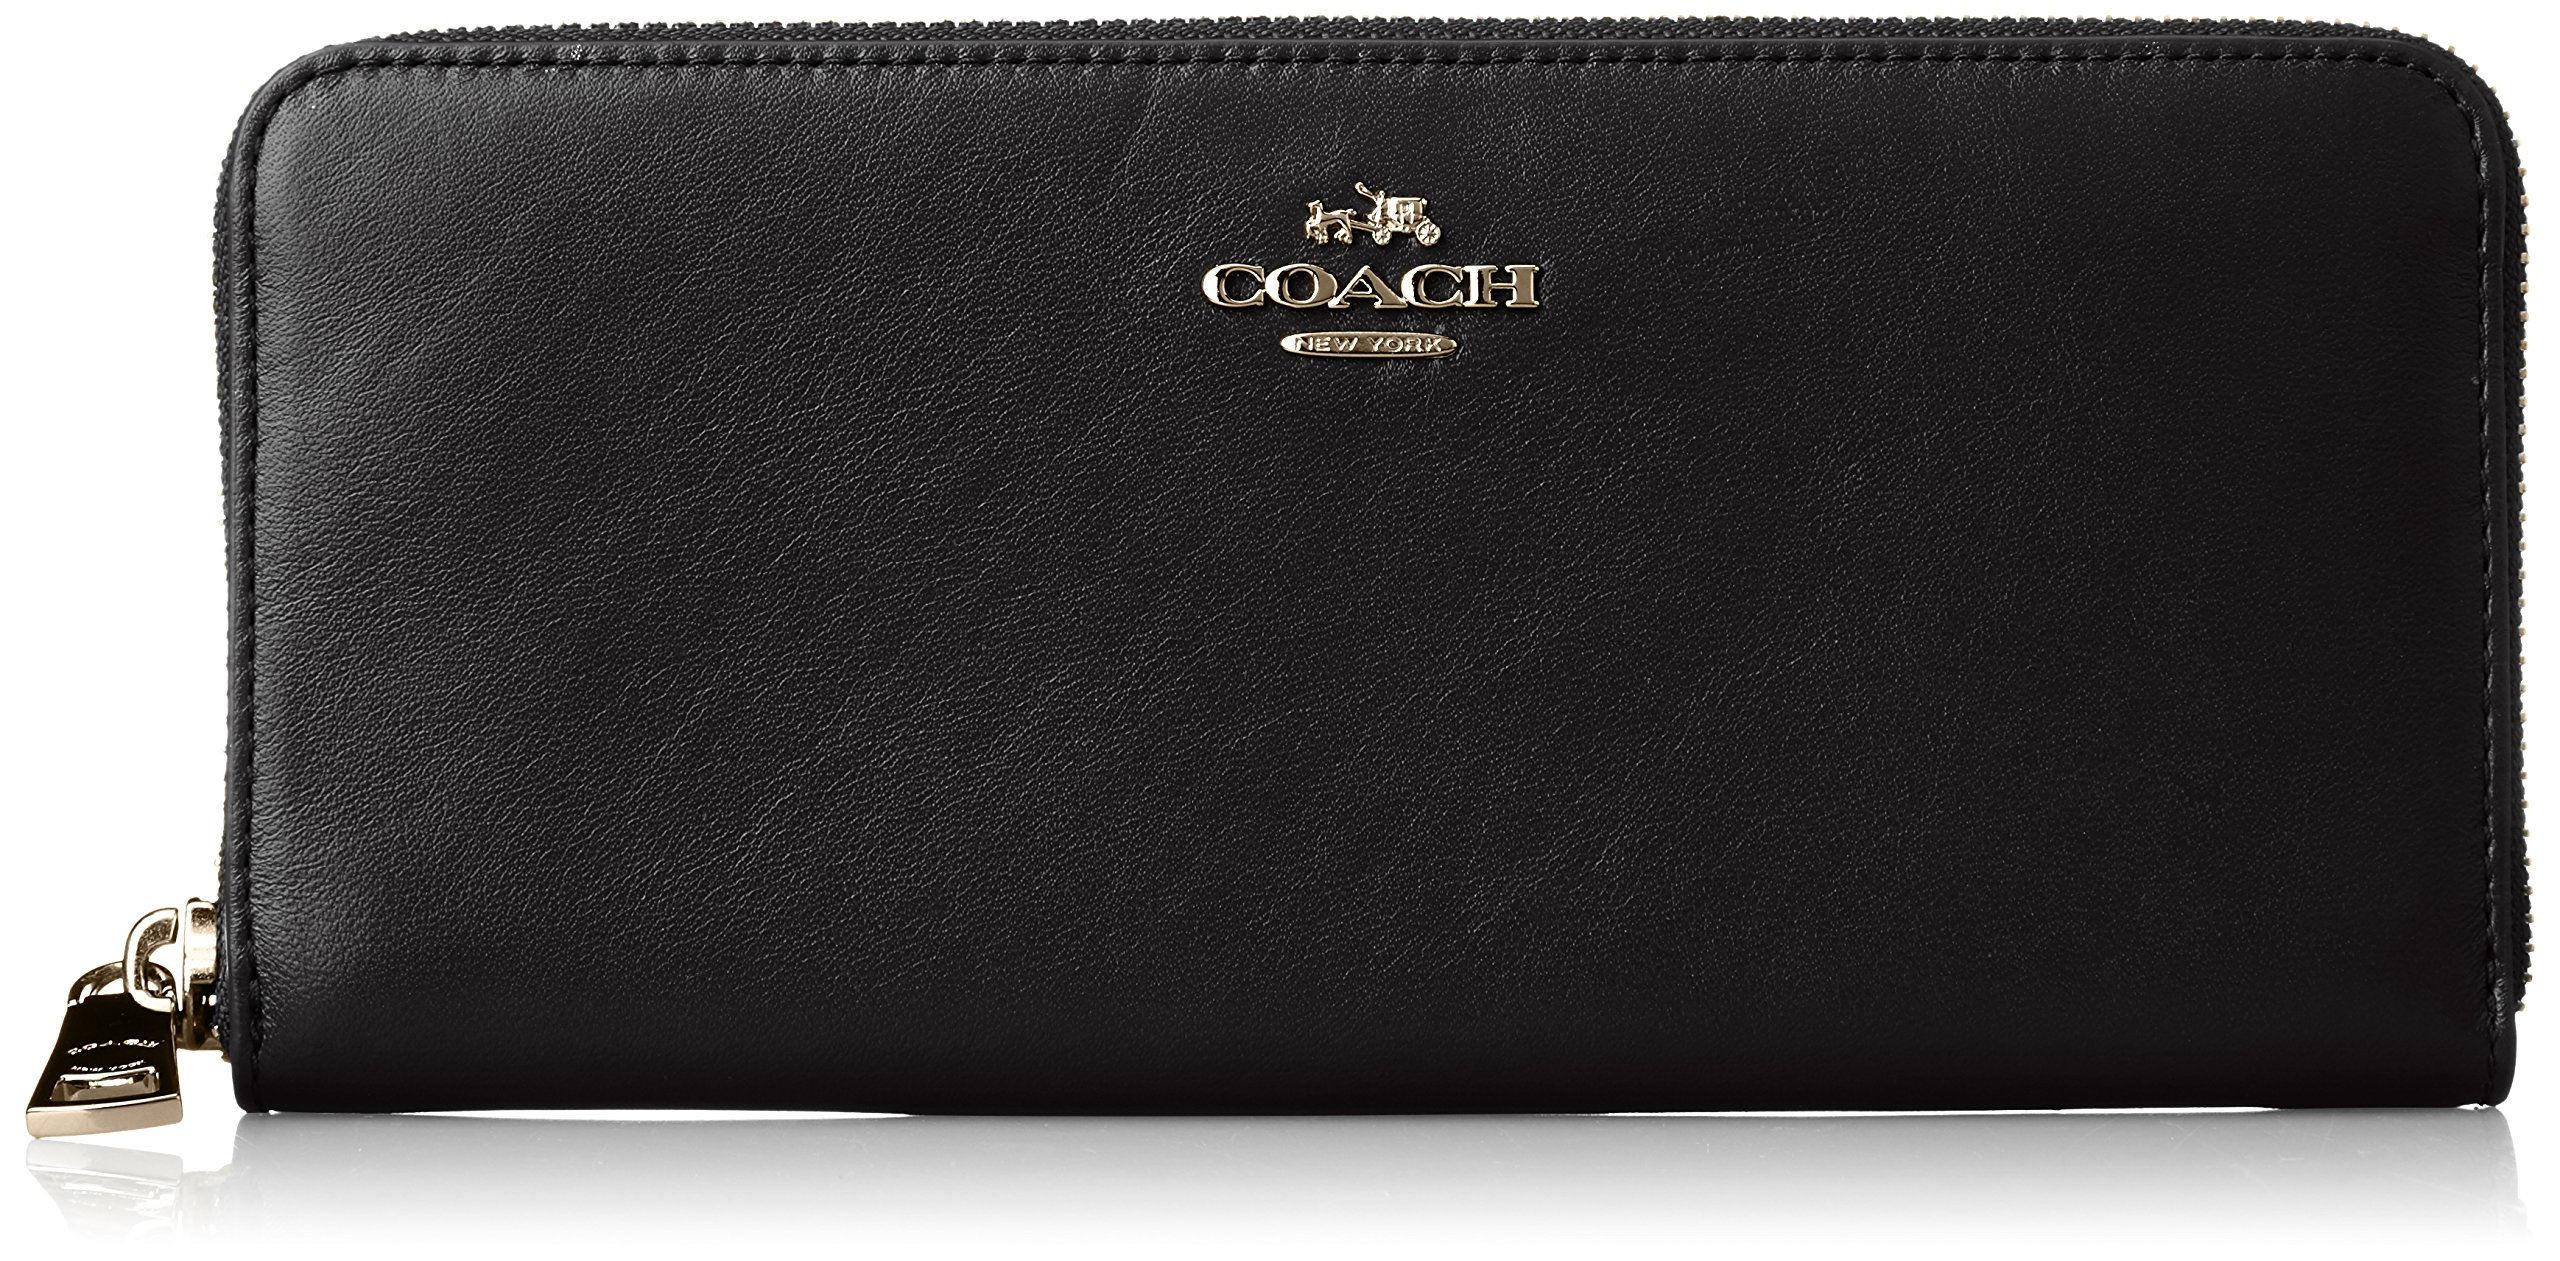 COACH Women's Smooth Slim Accordian Zip Li/Black One Size